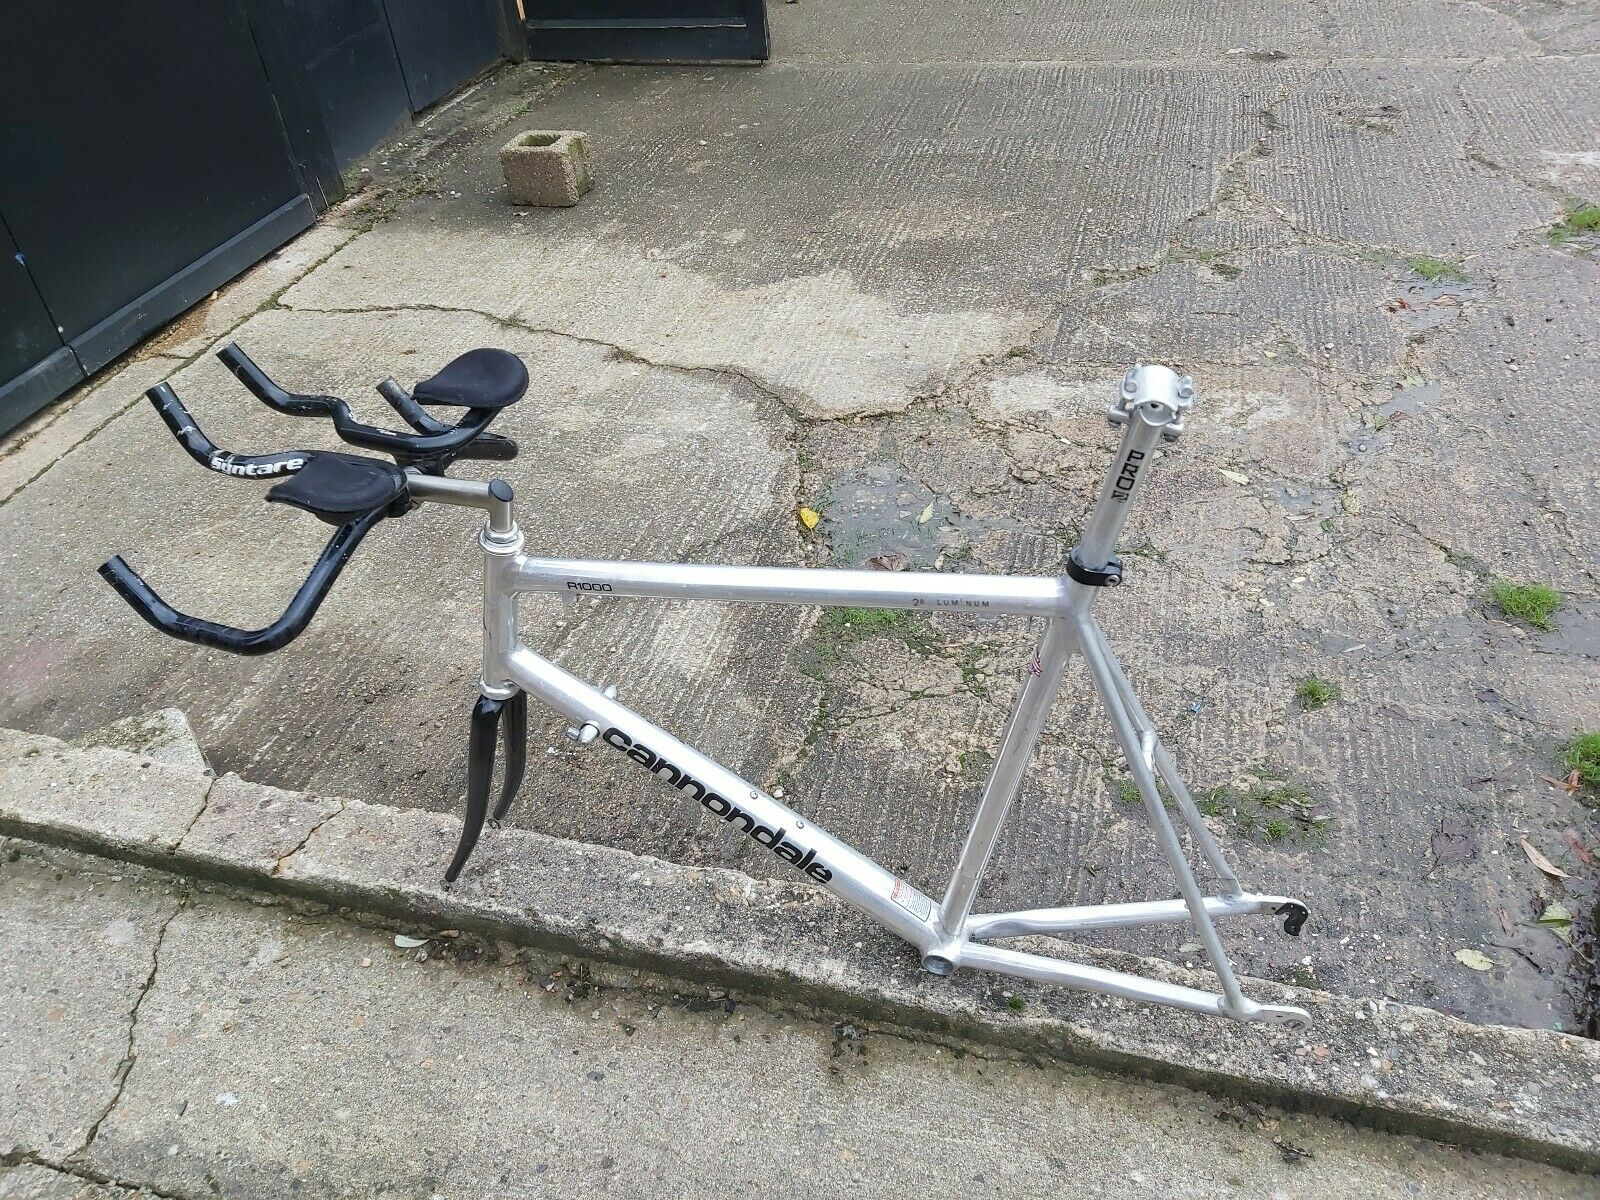 Cannondale R1000 59cm Bicycle Frameset